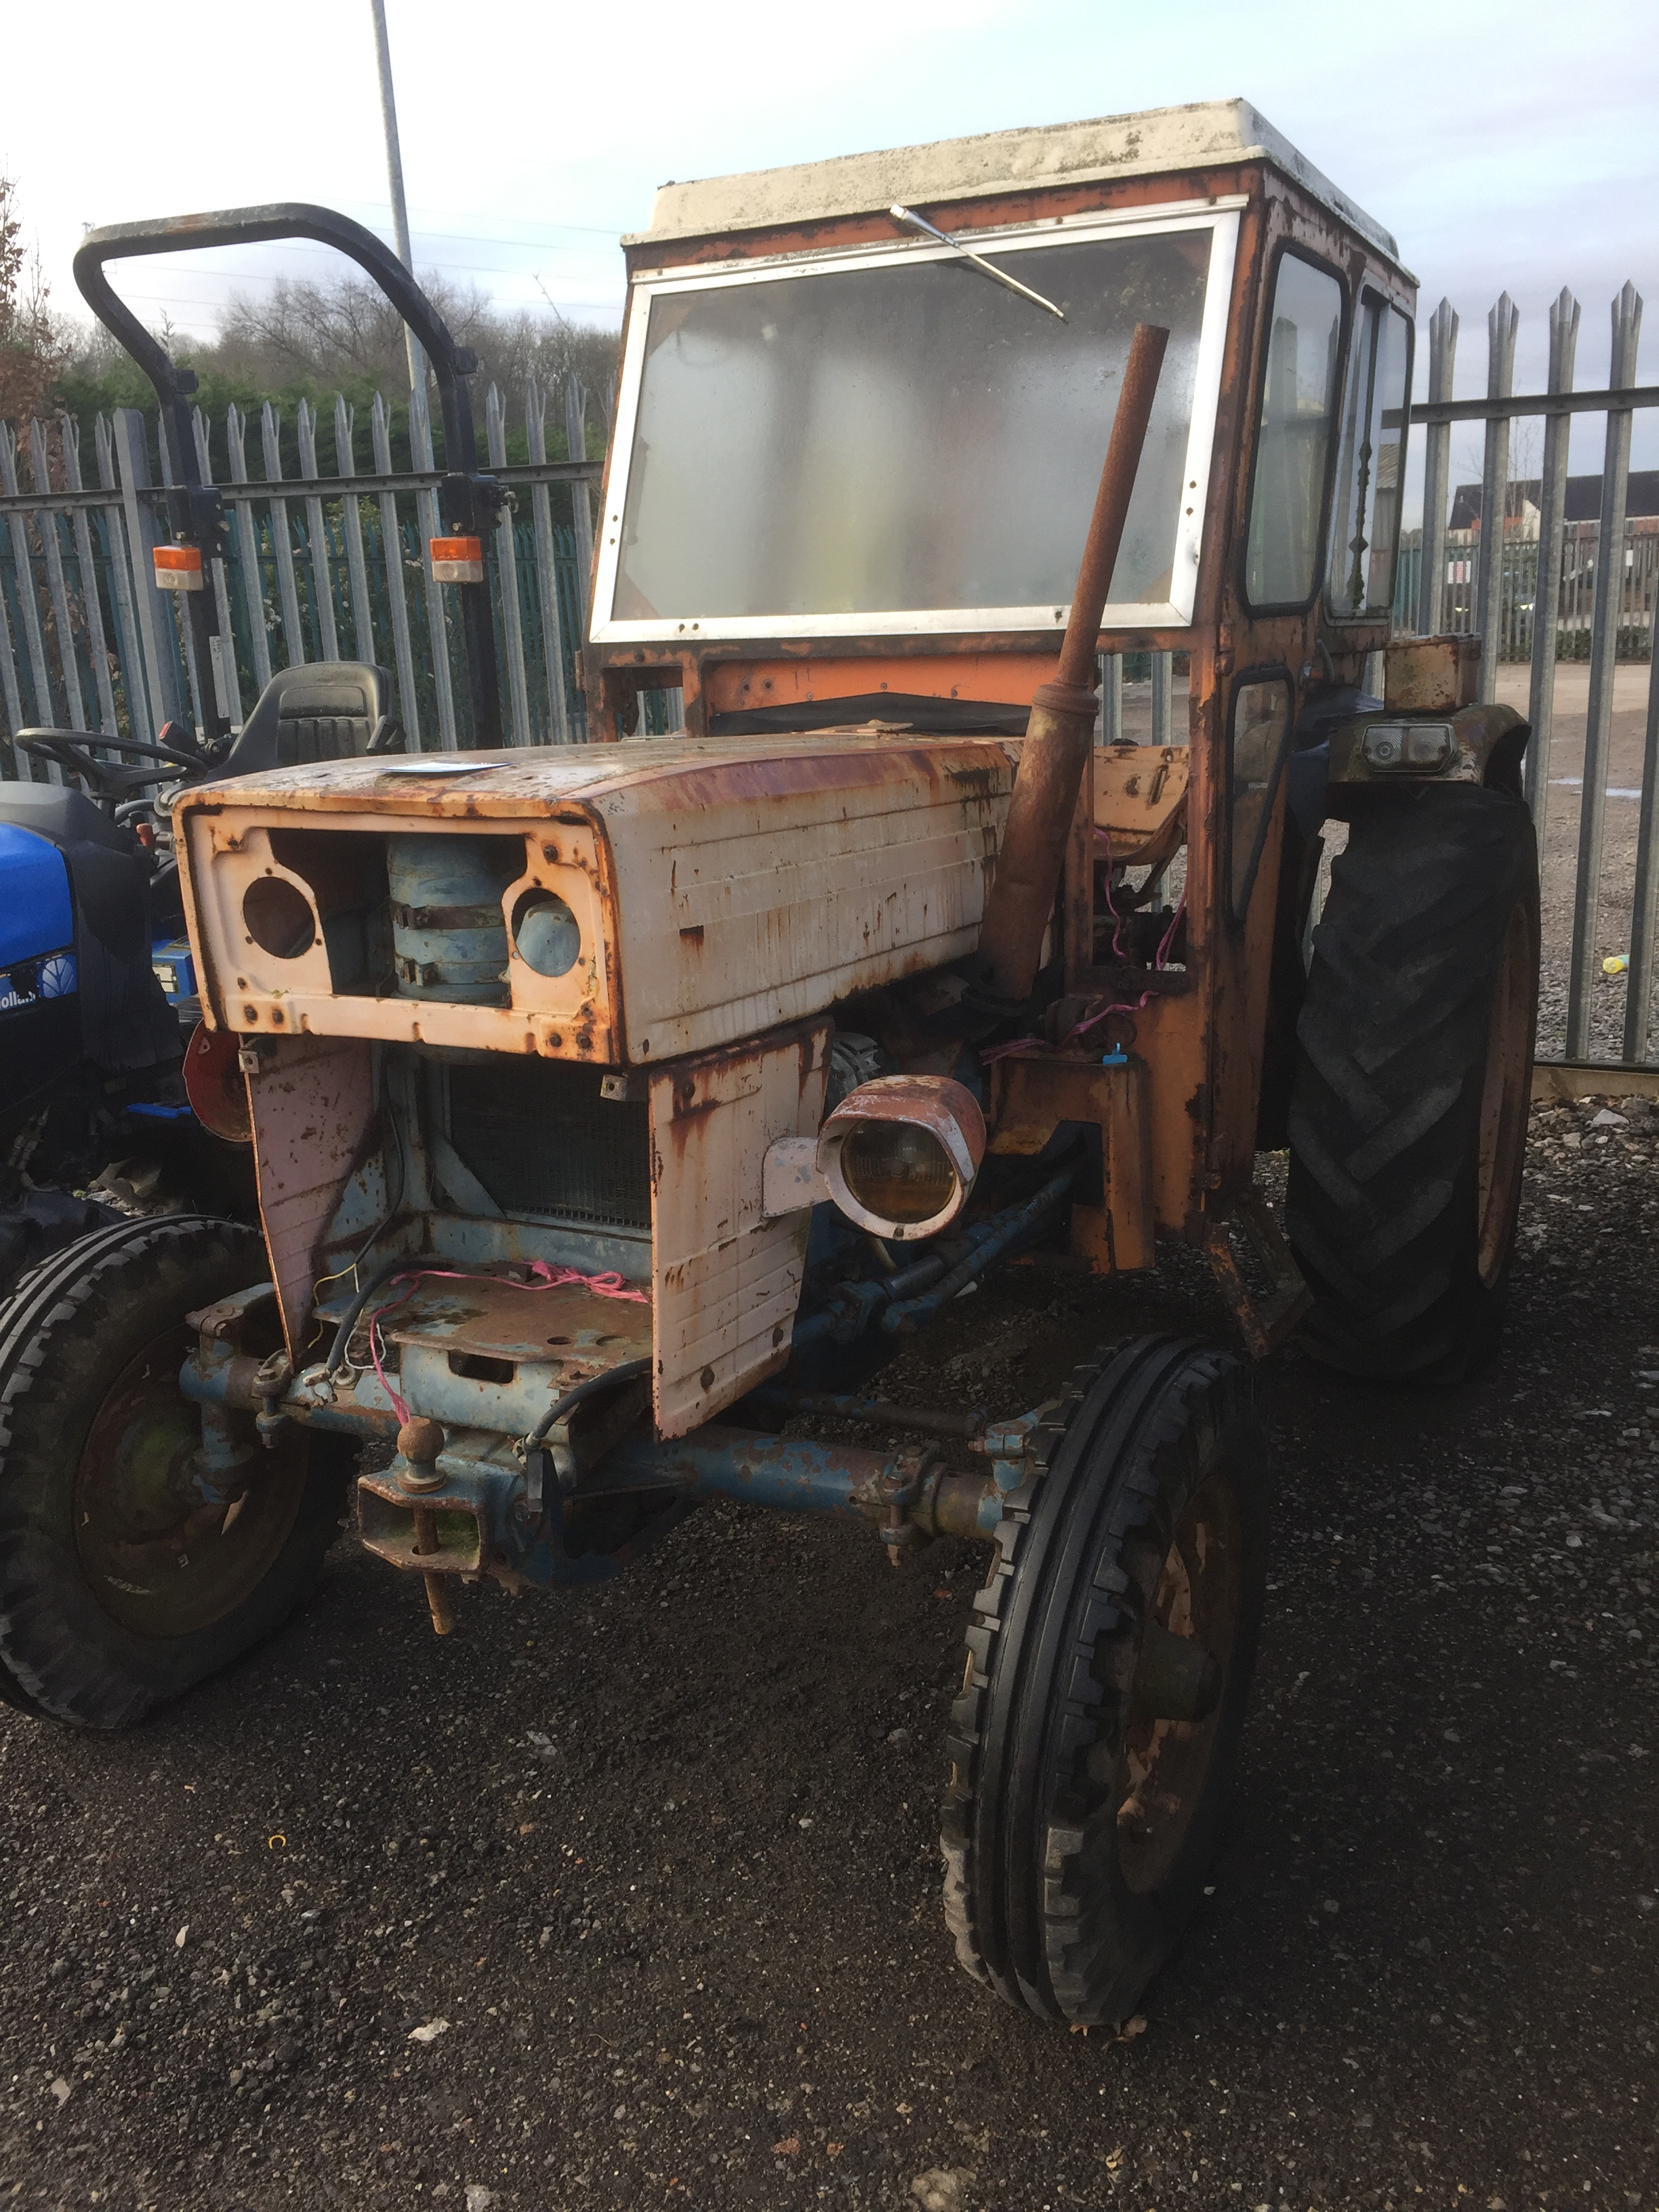 Lot 2 - Brasov Universal U445 2WD tractor, Registration No. N367 NAD